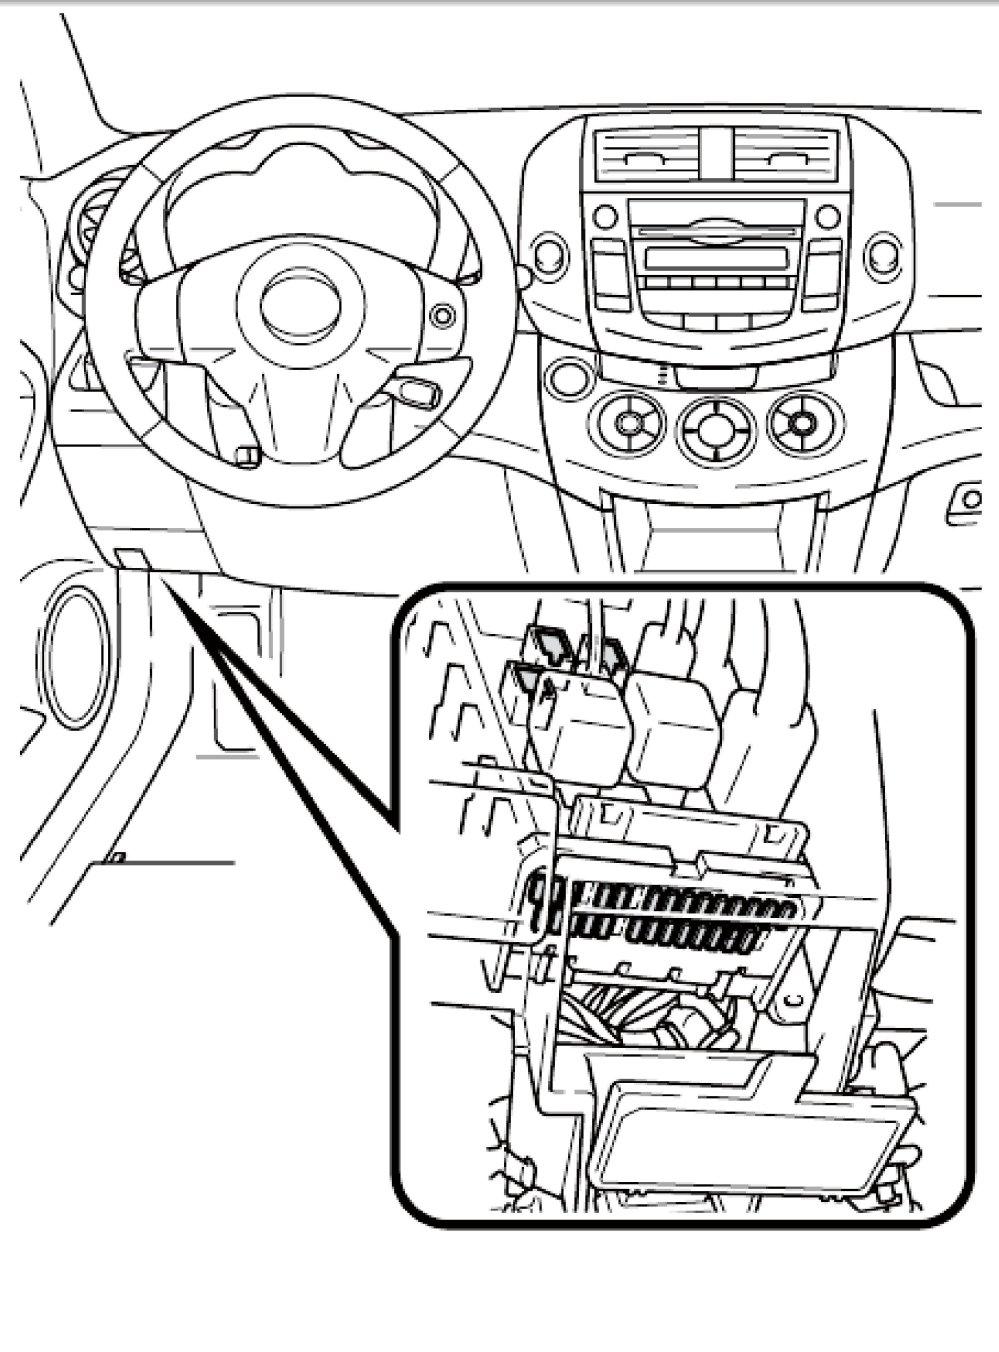 medium resolution of 1996 oldsmobile 88 fuse box location 15 10 fearless wonder de u2022oldsmobile 88 fuse box